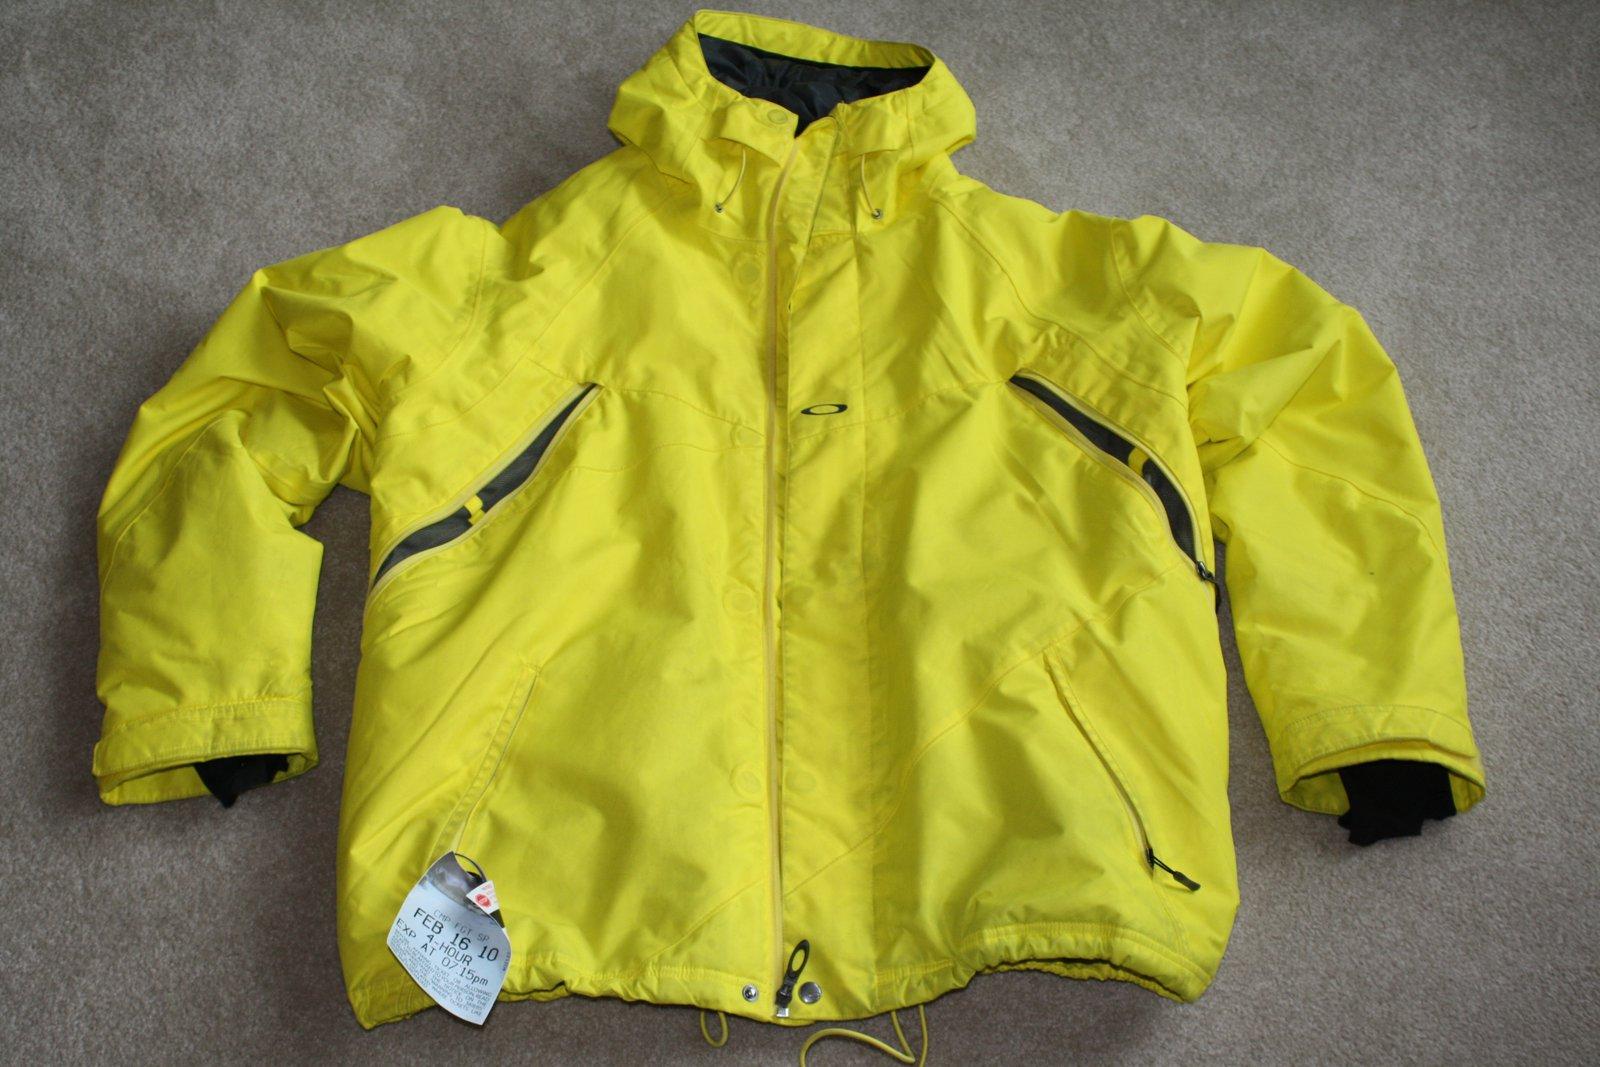 Highlighter yellow Oakley coat L 9.5/10  $90